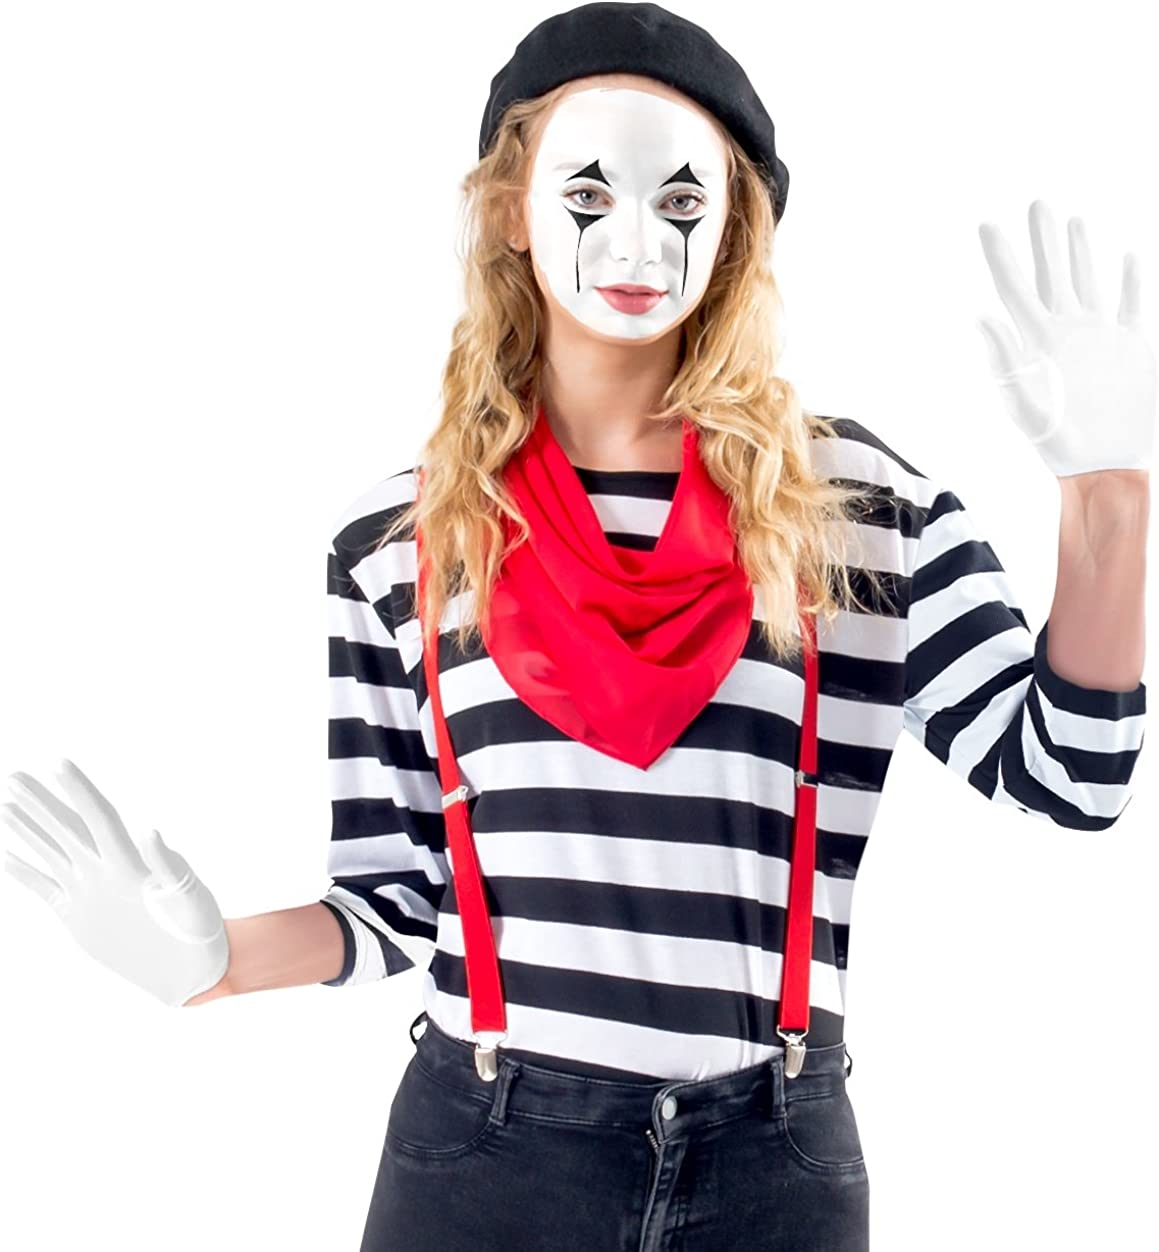 Amazon.com: De la Mujer Mime Costume Set con maquillaje Kit ...